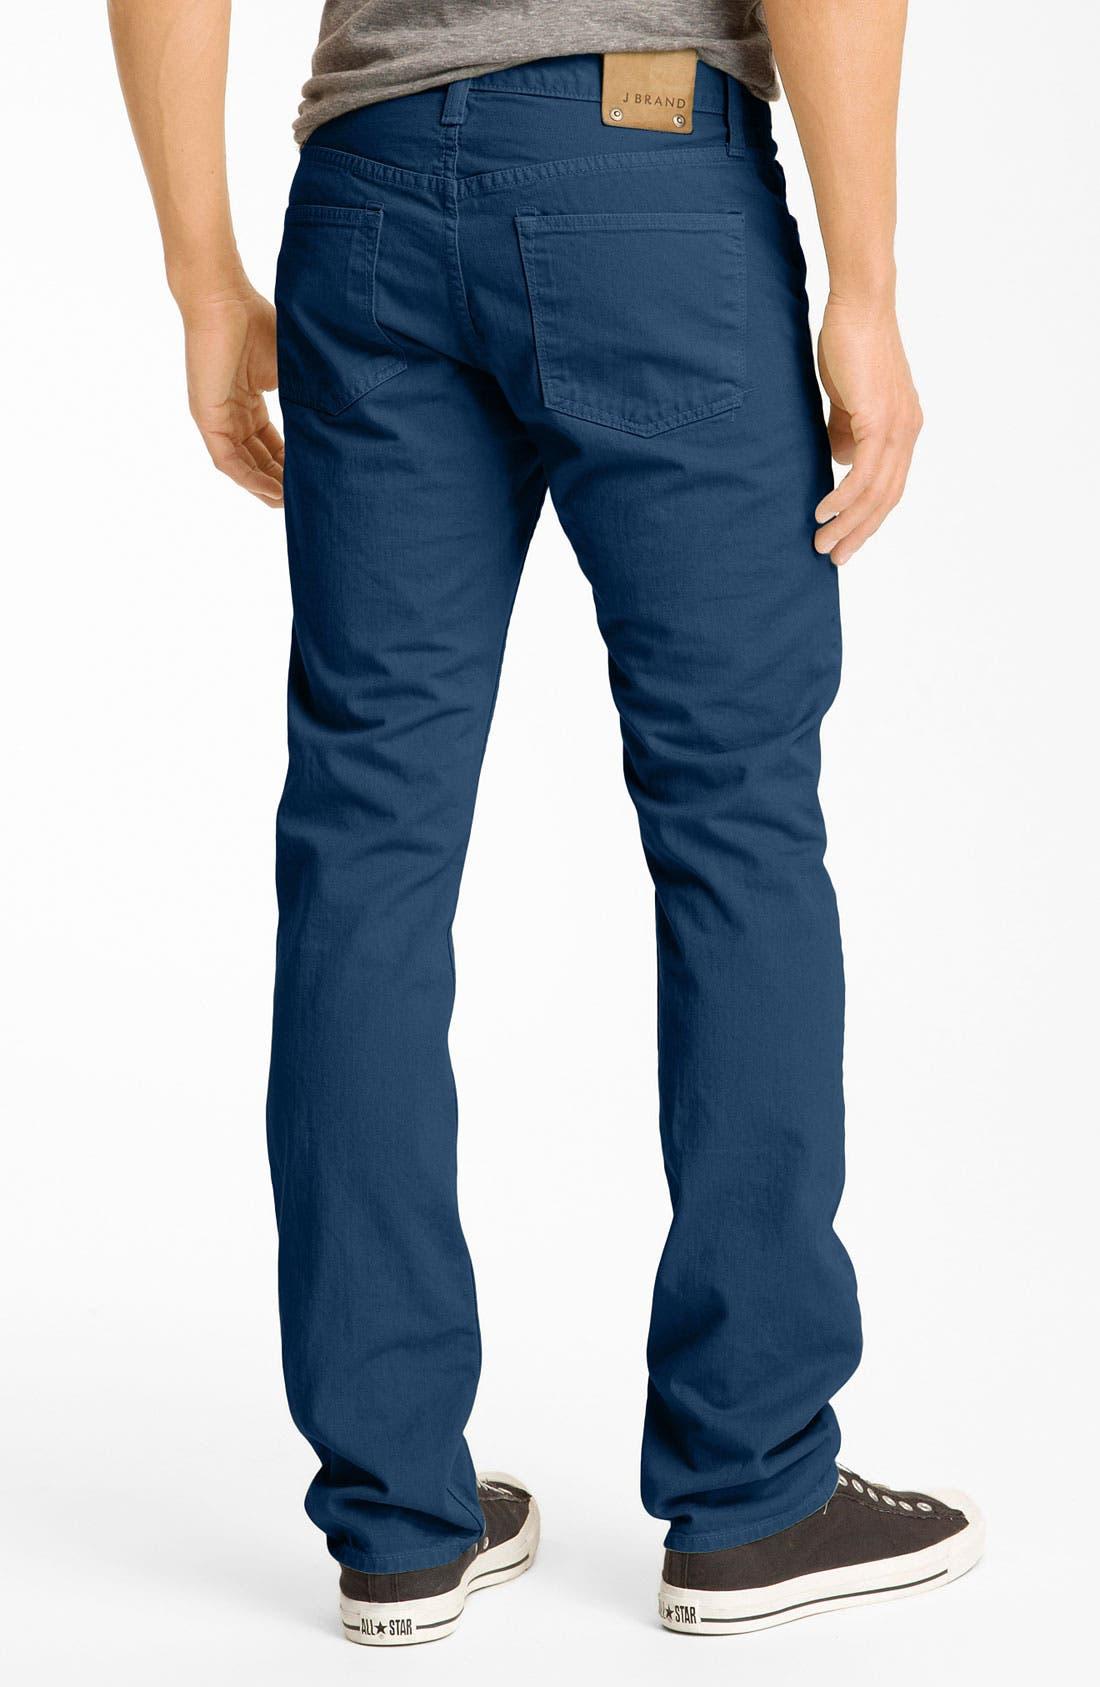 Alternate Image 1 Selected - J Brand 'Kane' Slim Straight Leg Jeans (Crafted Monster)